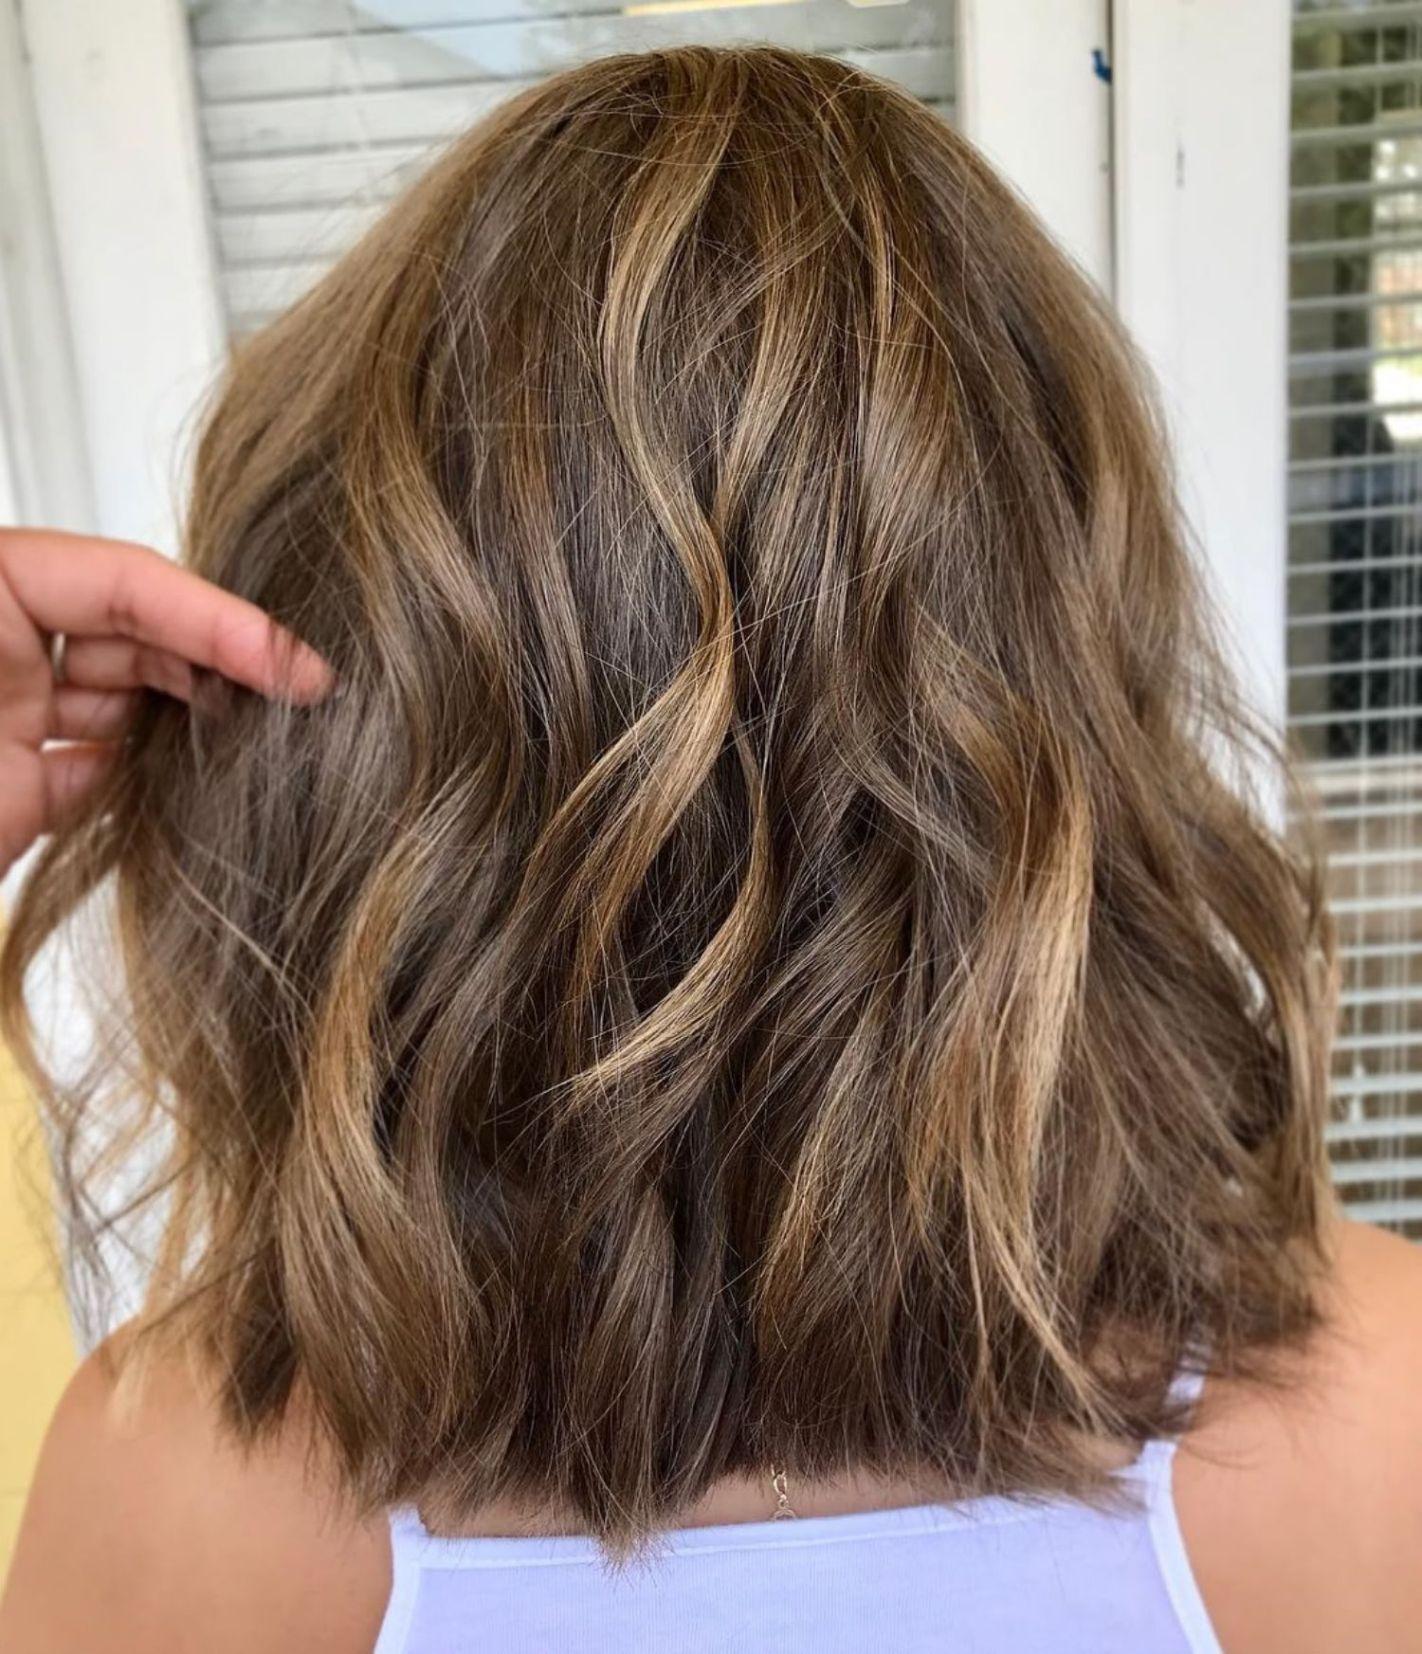 Thick Shaggy Golden Brown Lob   Thick hair styles medium ...